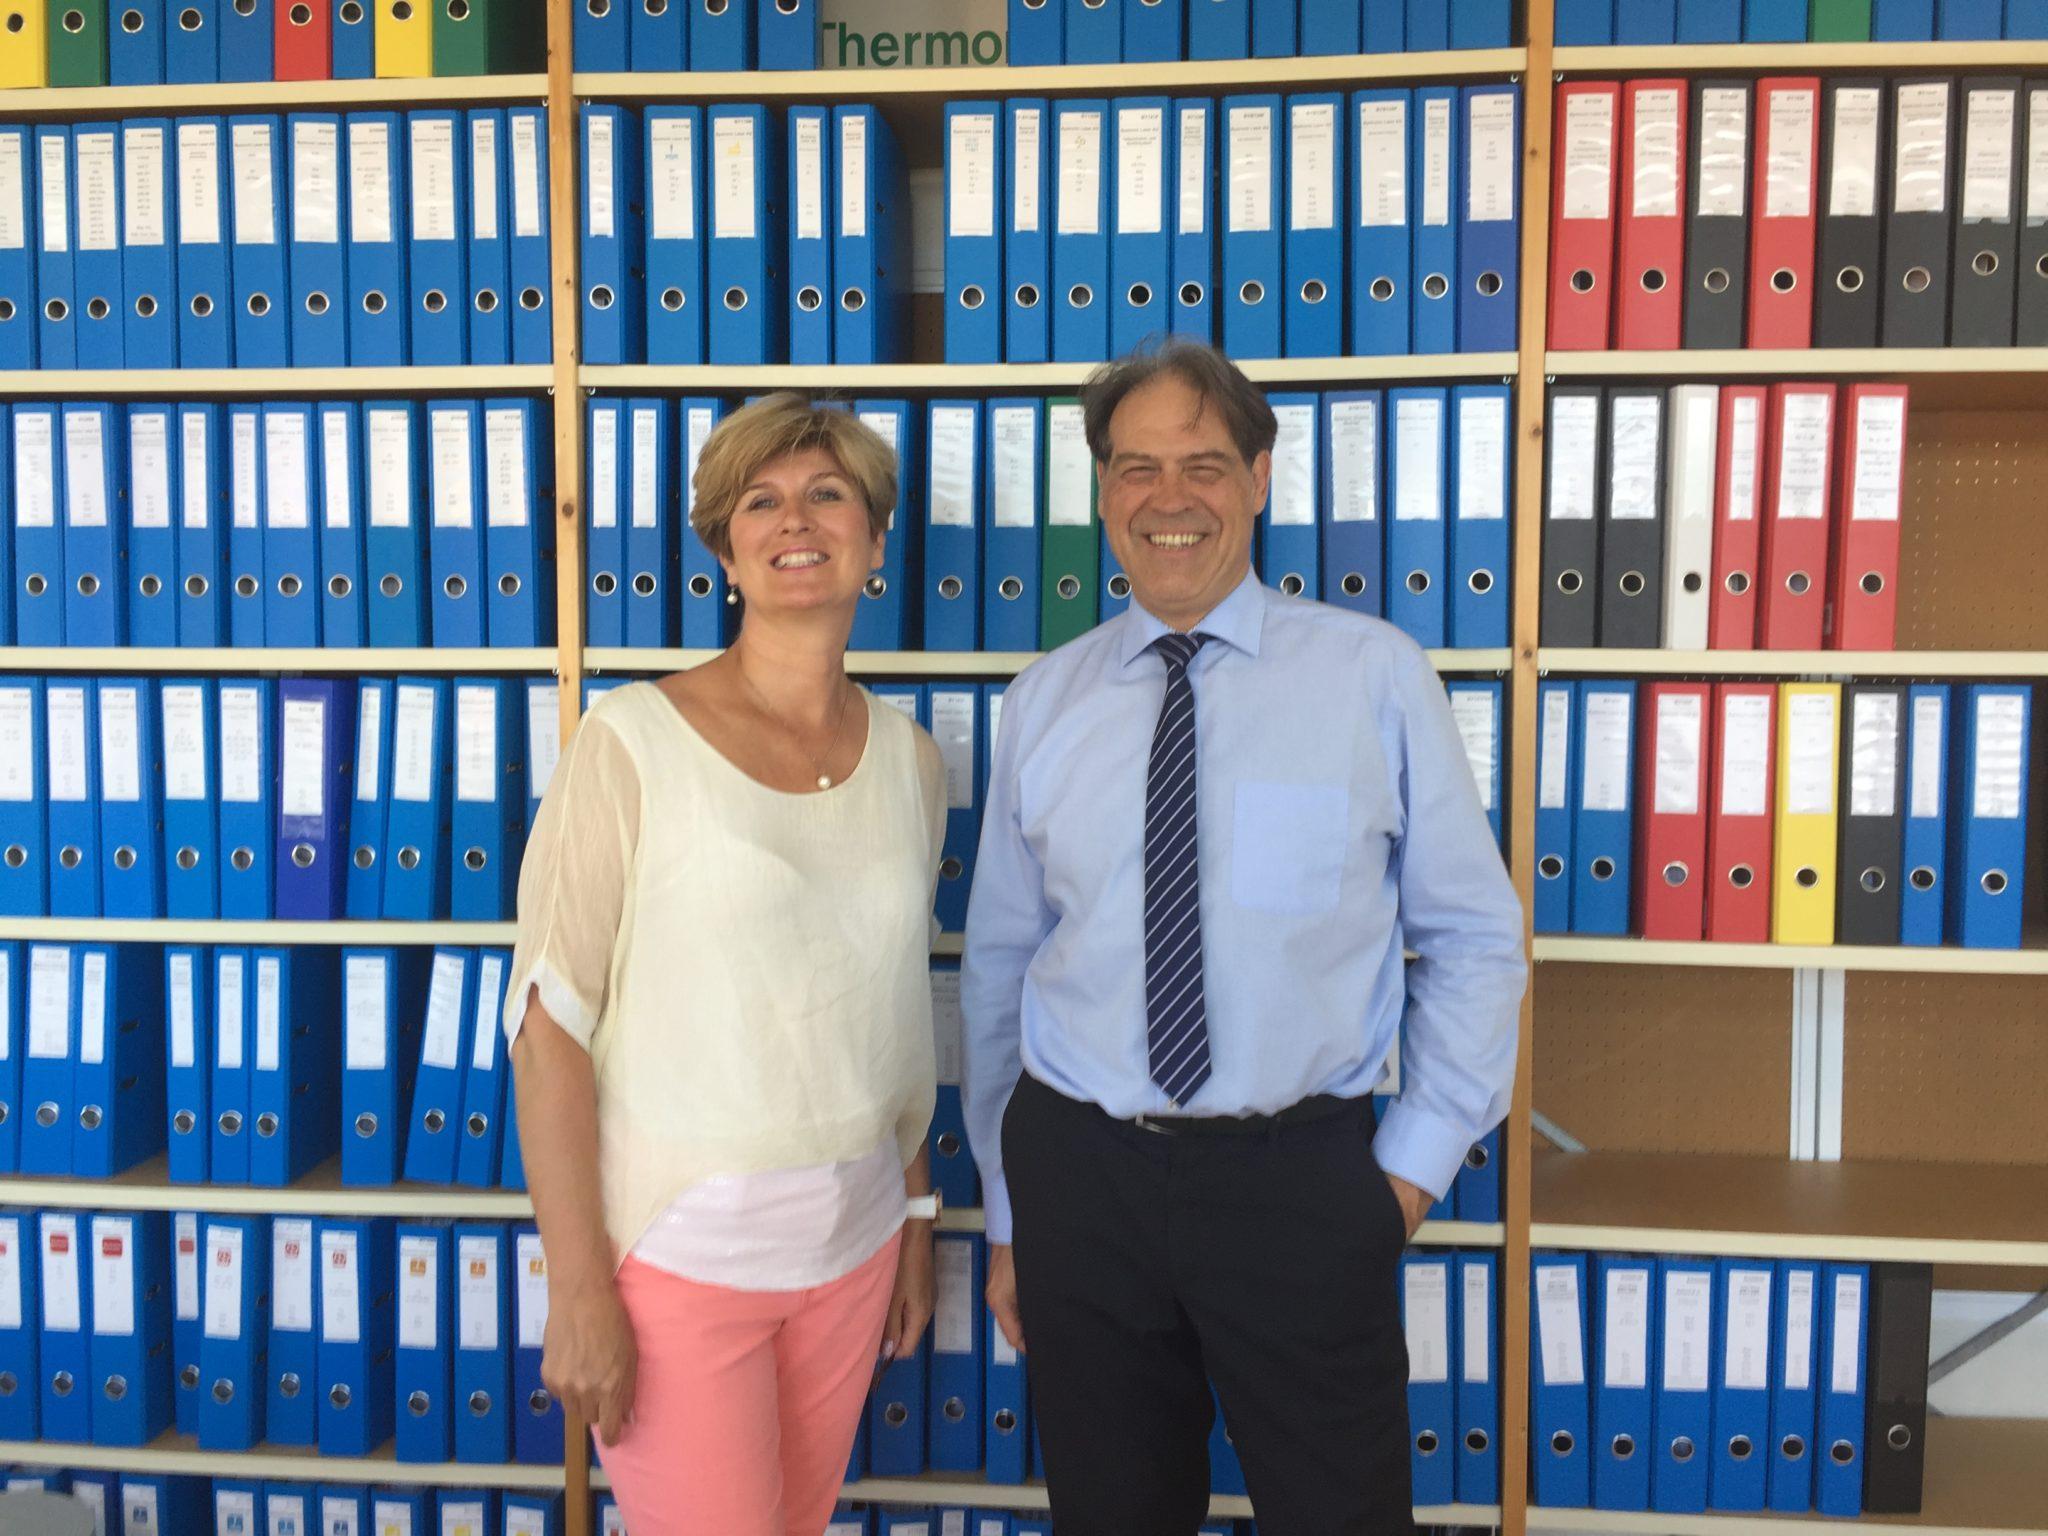 Дневник патентоведа № 122 Hаши швейцарские партнёры